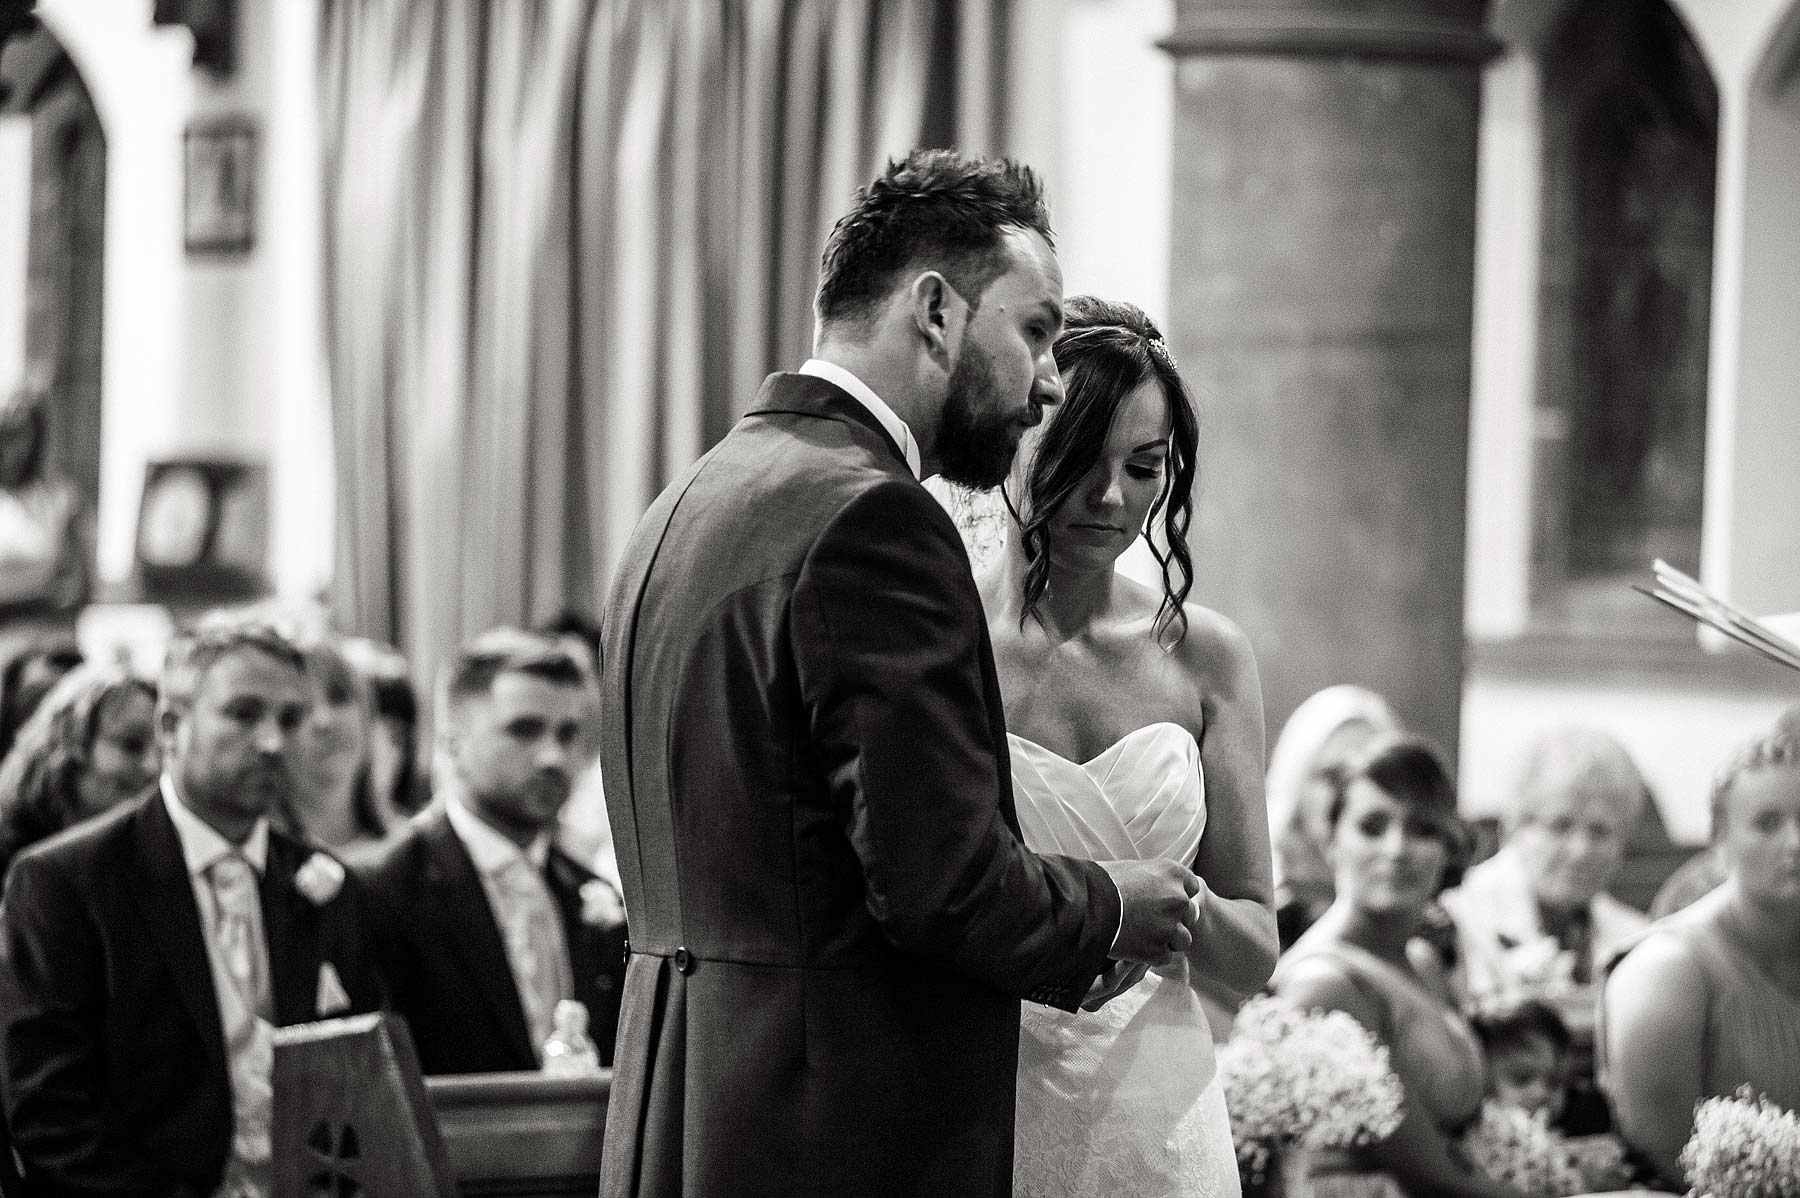 moat-house-church-wedding-photographs-023